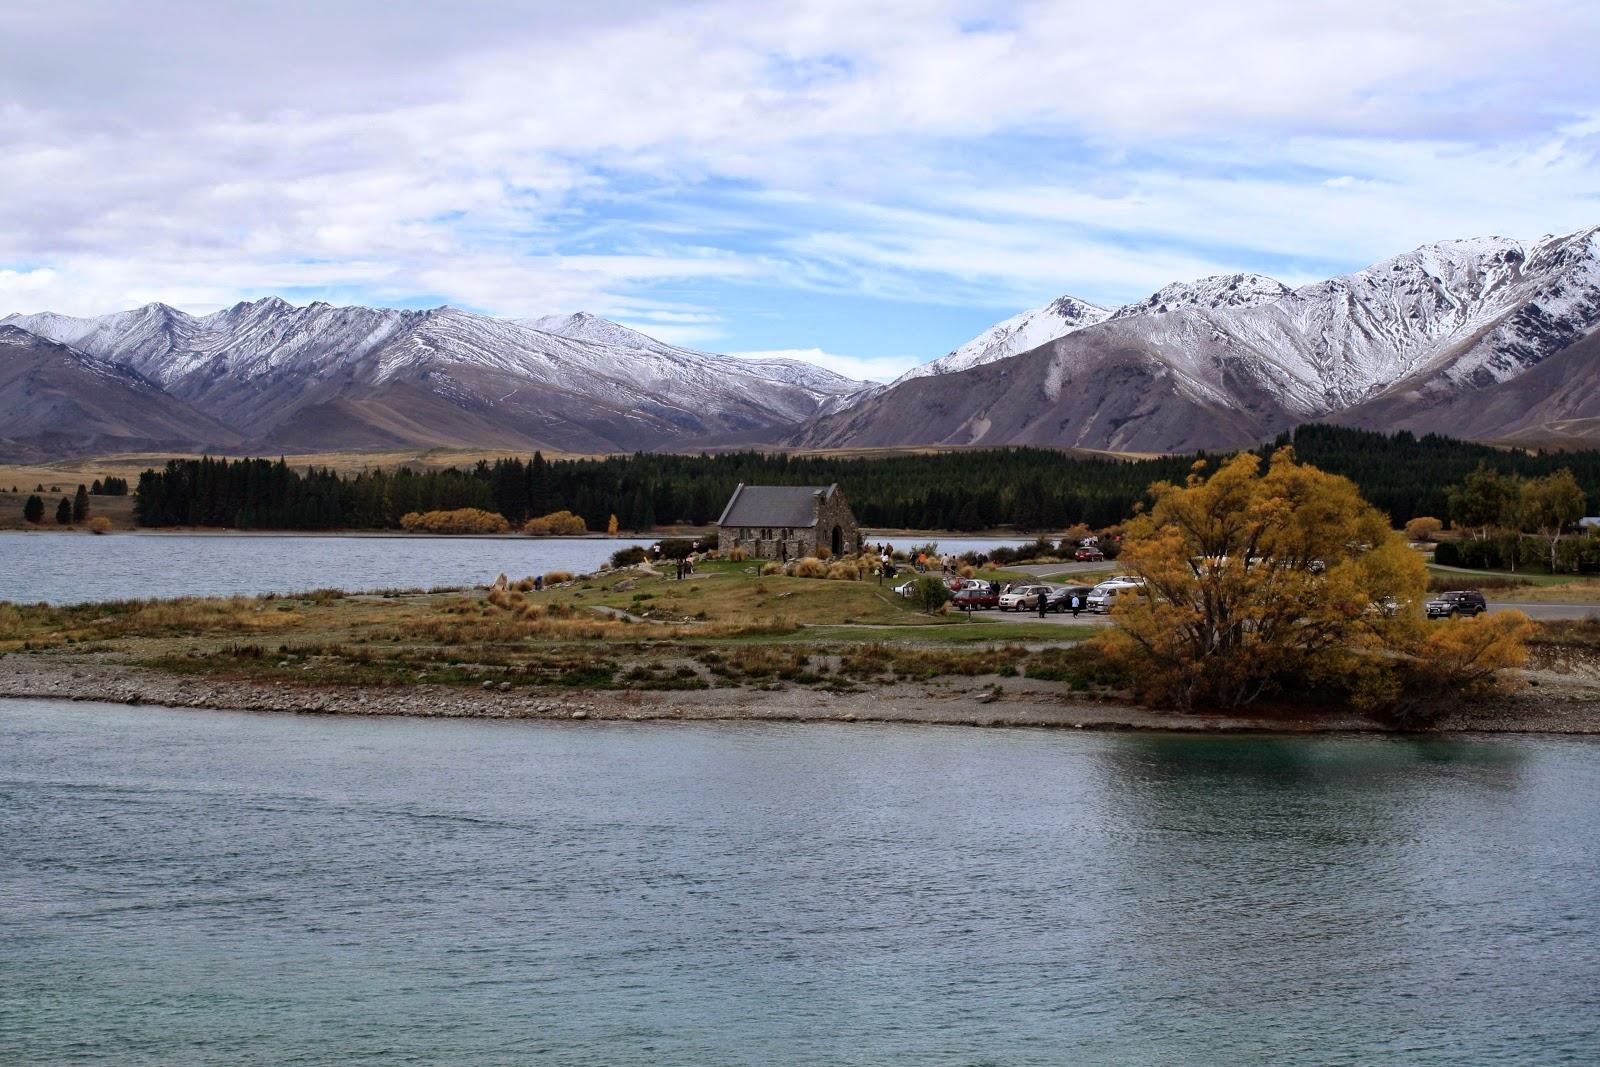 The Church of the Good Shepard at Lake Tekapo.